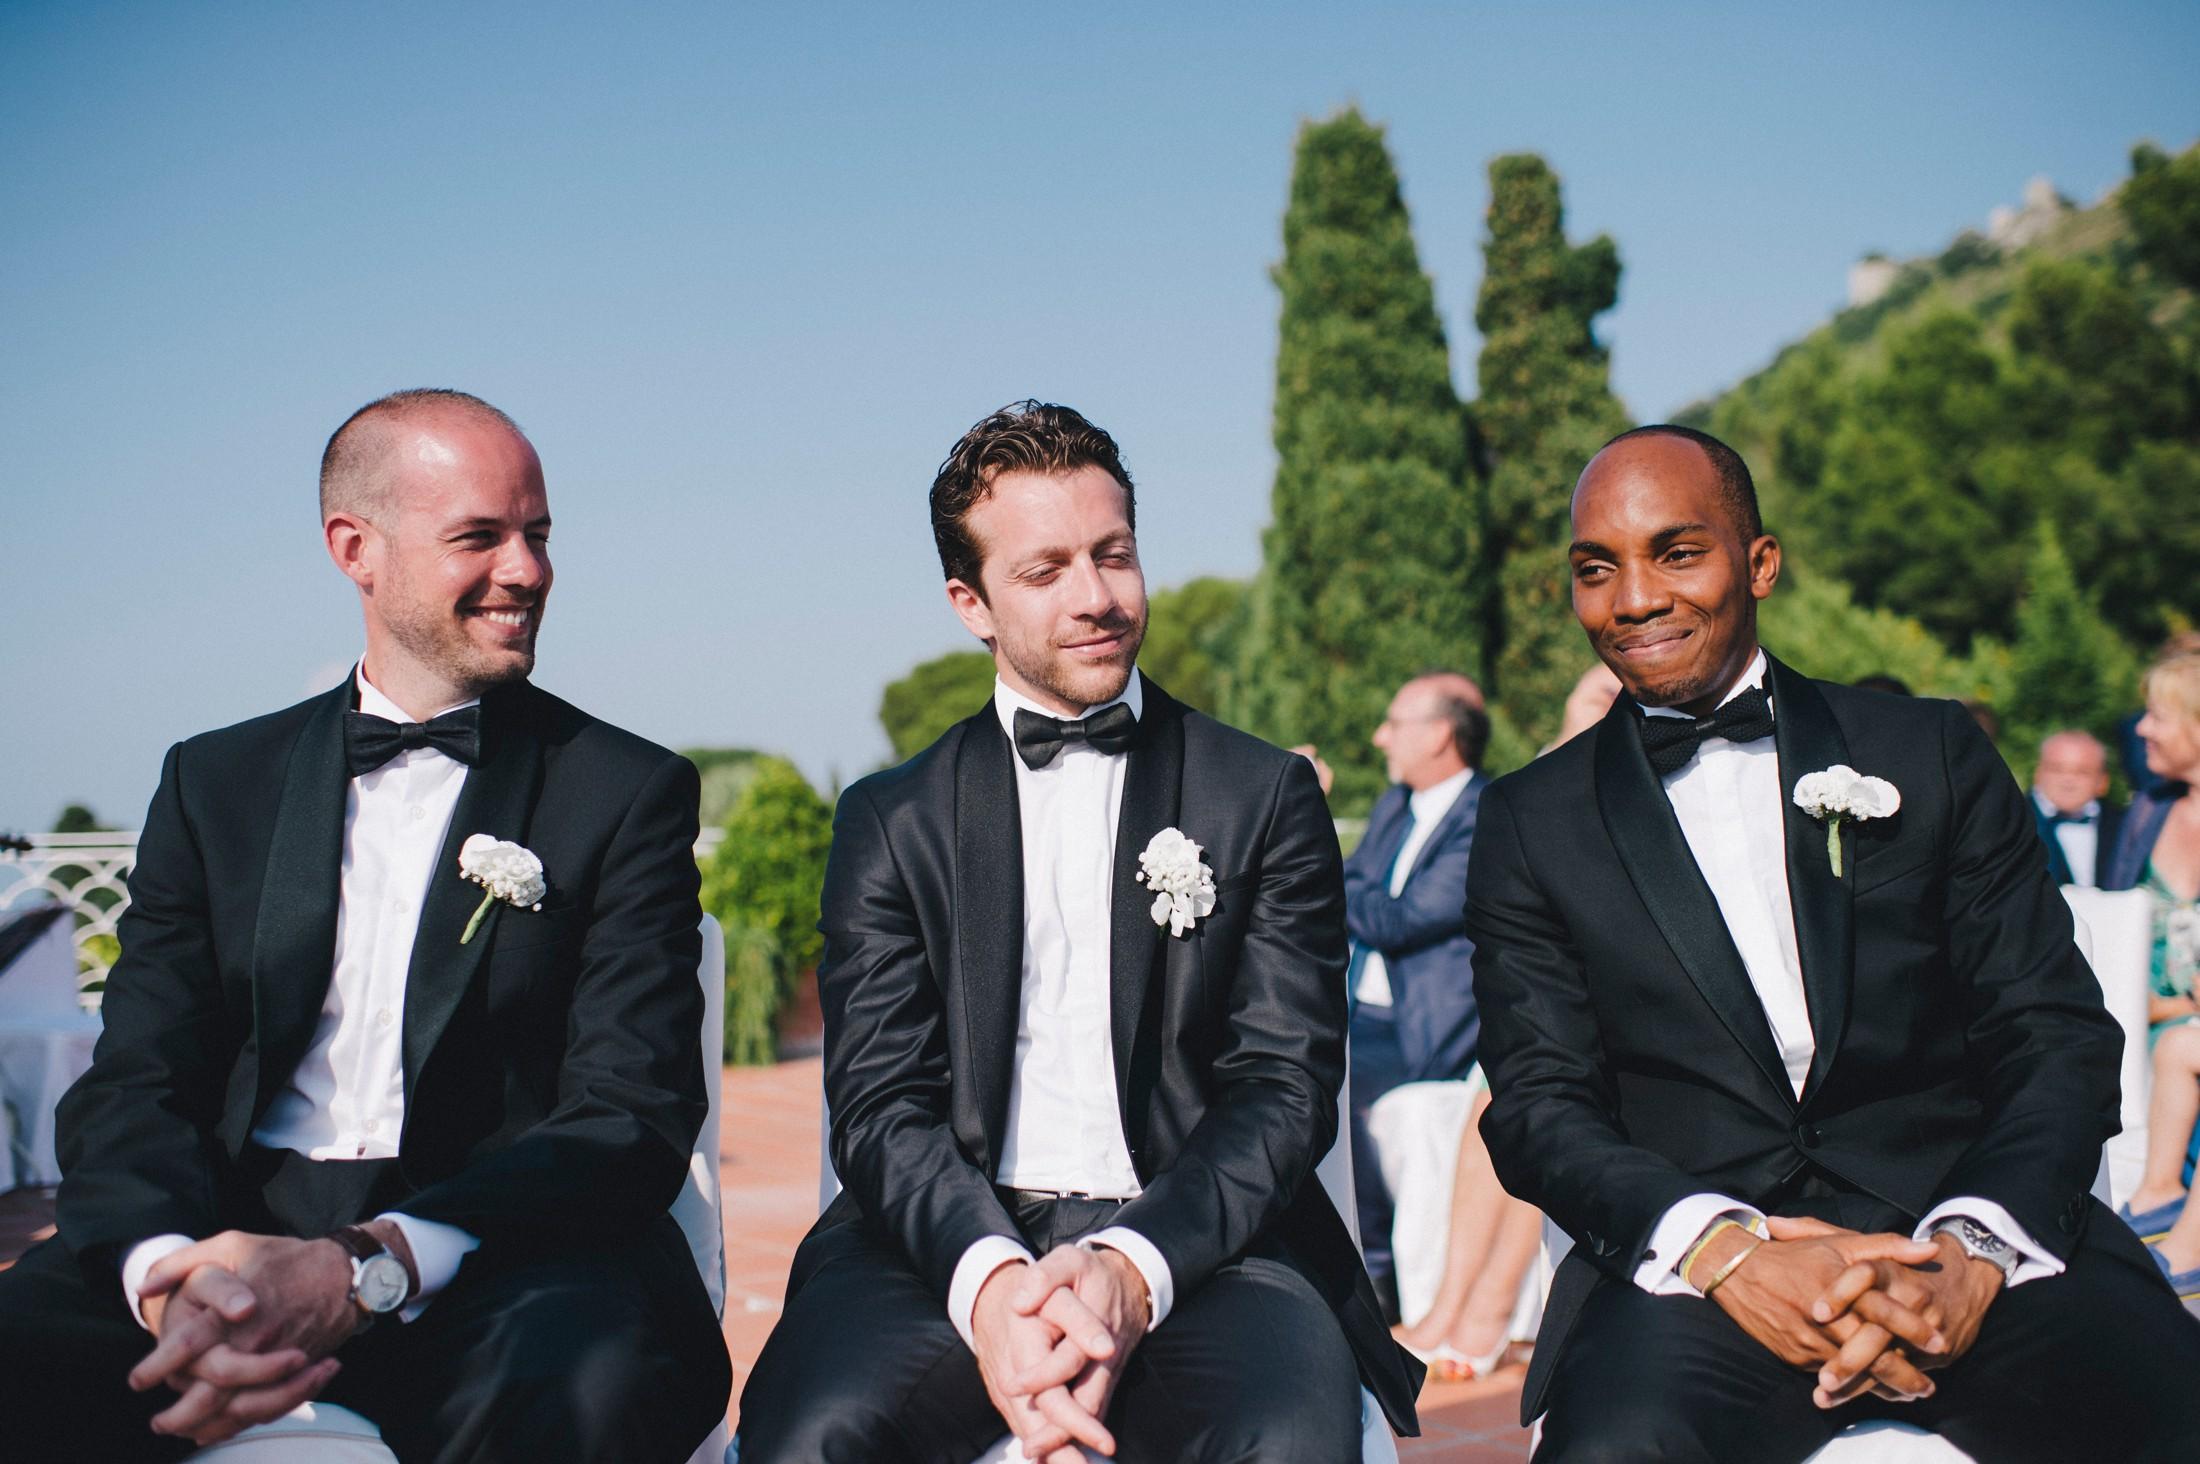 best men during the wedding ceremony